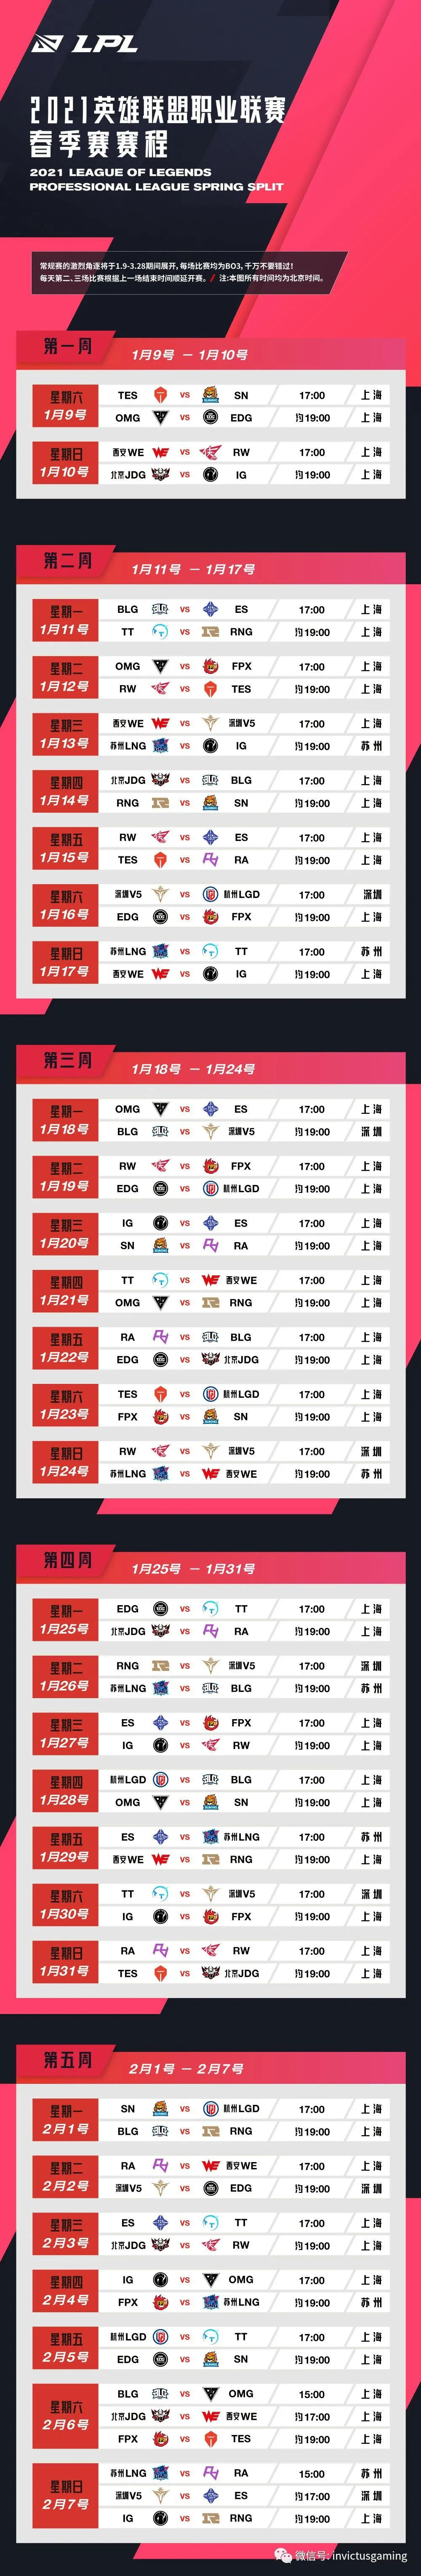 「LOL」2021LPL春季赛赛程公布